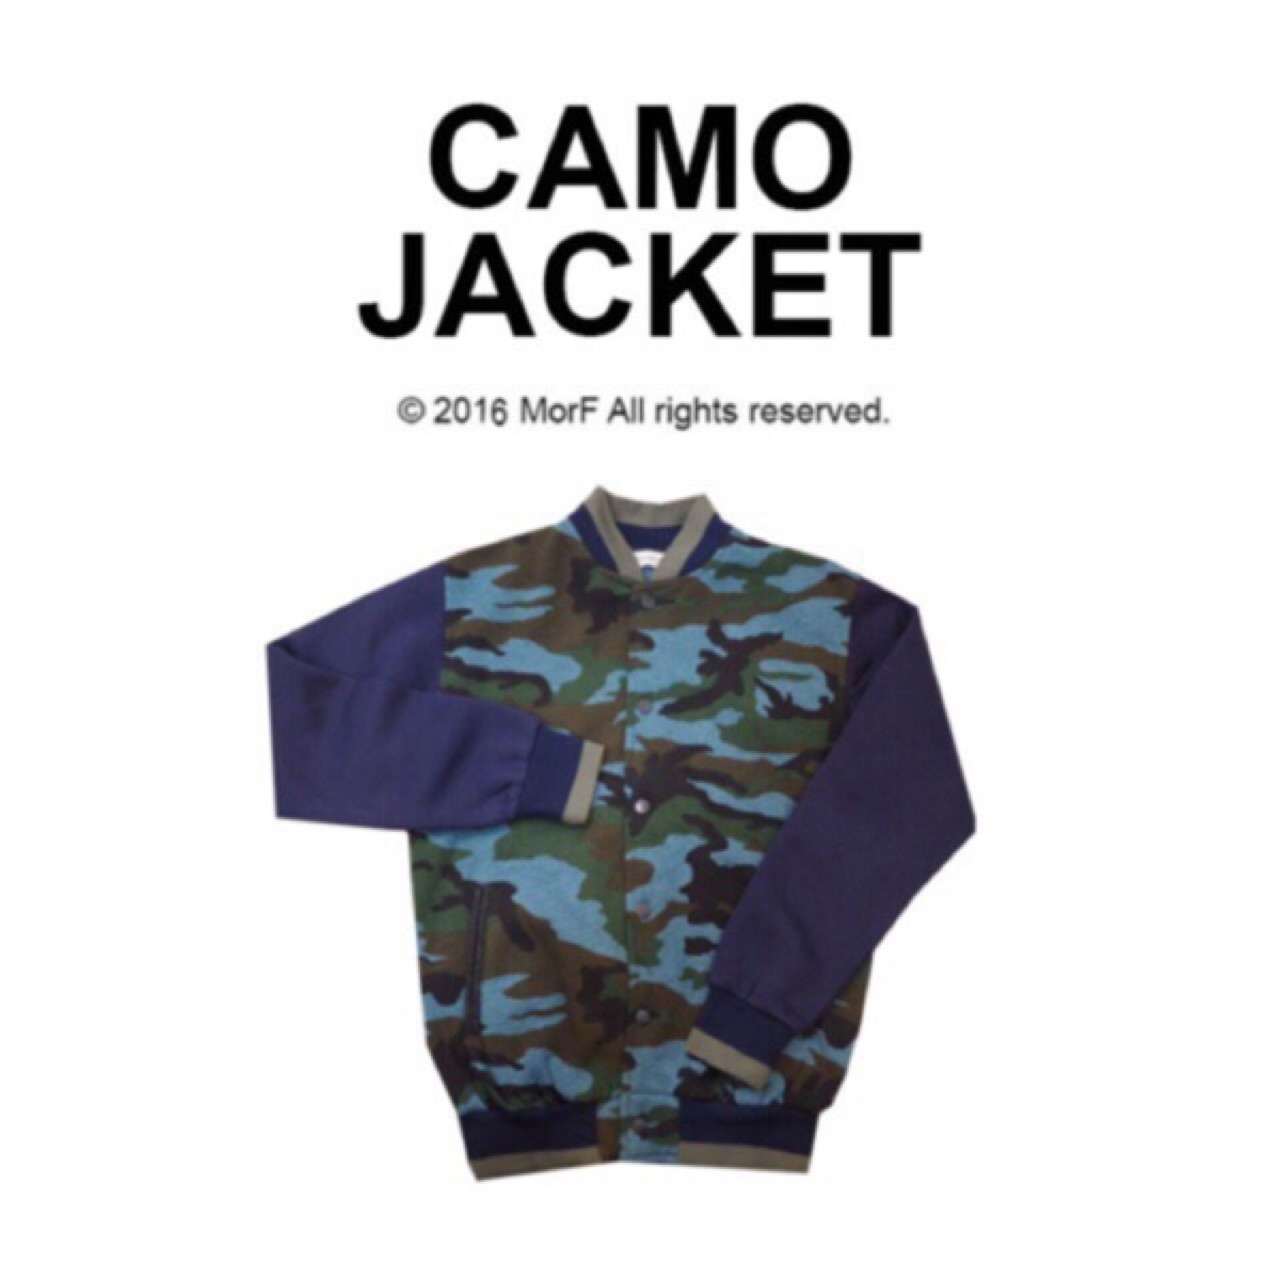 winter,camo,camouflage,ลายทหาร,ลายพราง,Baseball,morf_clothes